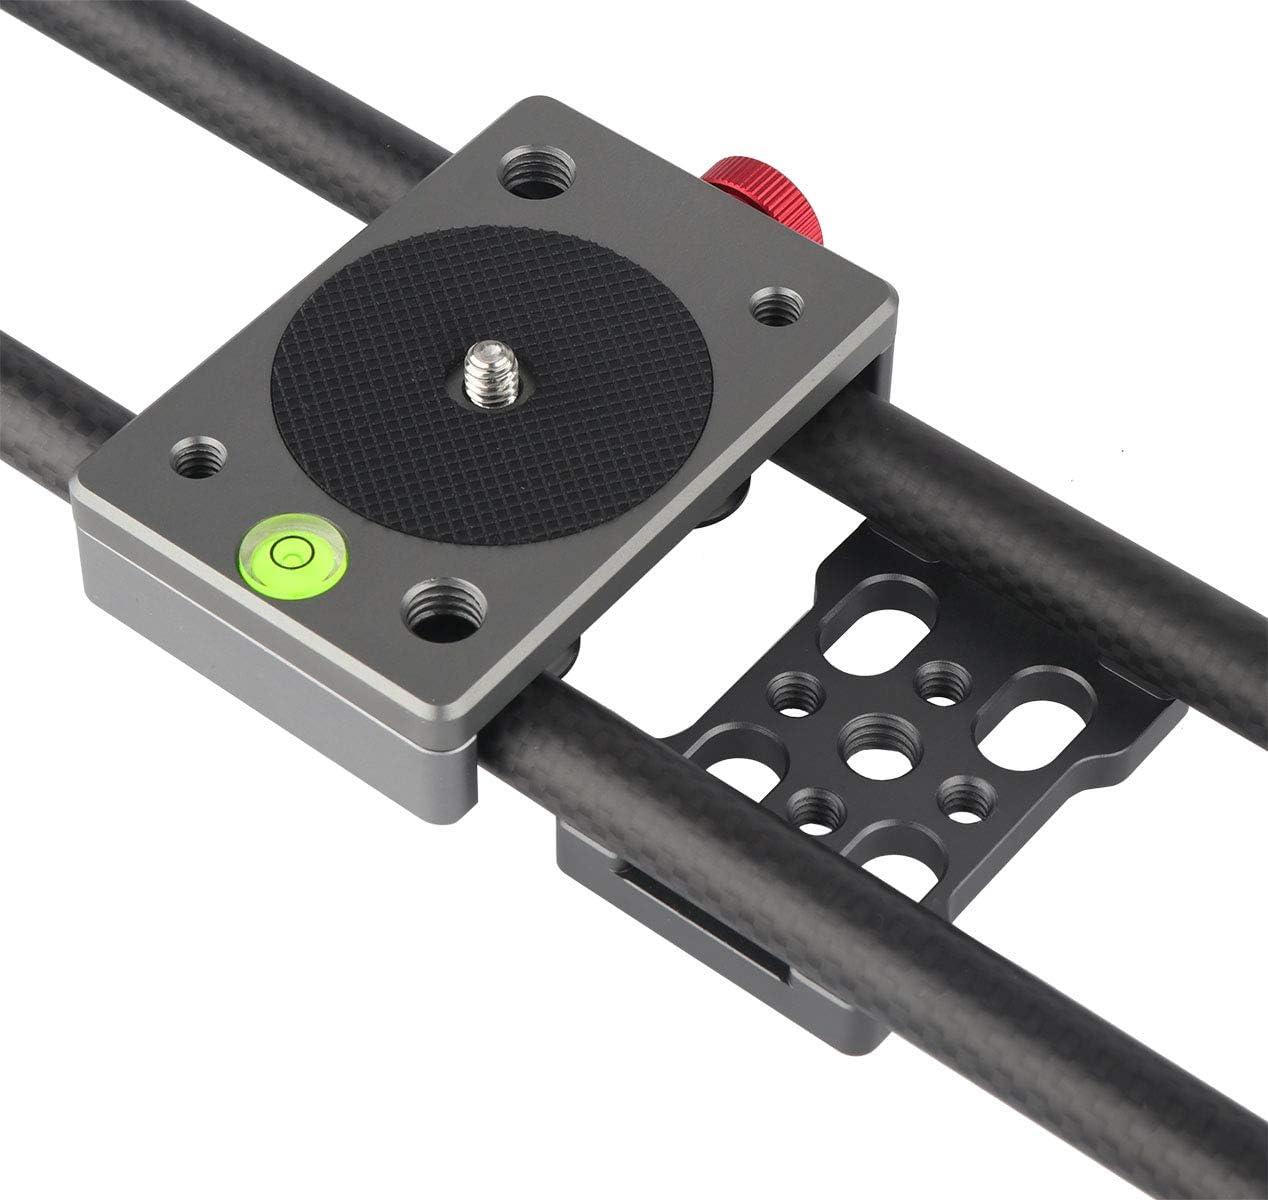 Camera Belt Strap 42cm Carbon Fiber Camera Track Slider Video Stabilizer DSLR Camera Rail Camcorder Filming Photo with 1//4 Screw Mount Holes Durable